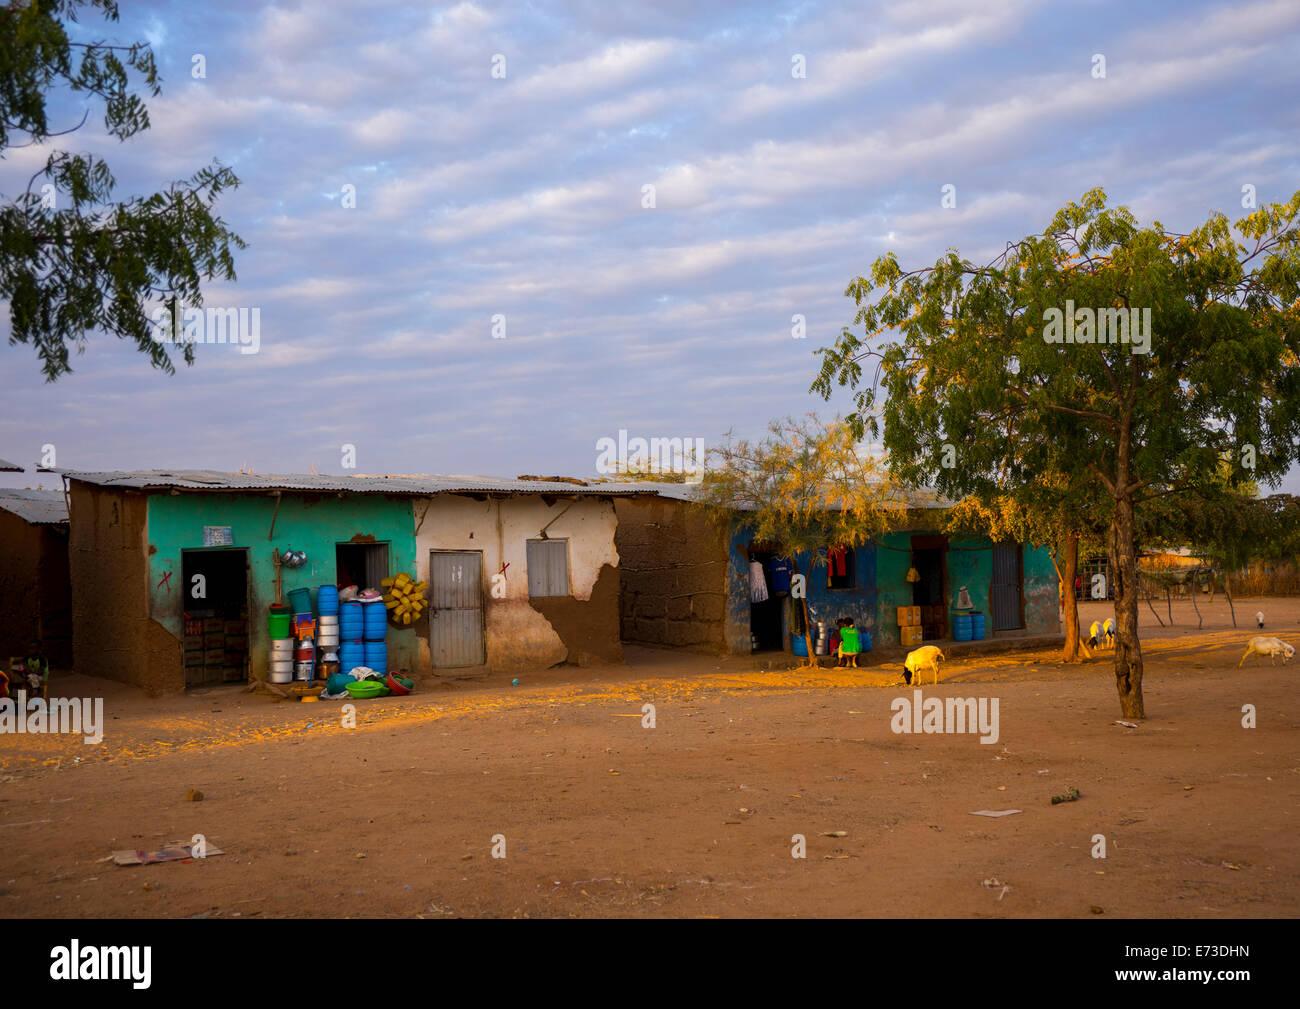 Shops In The City, Turmi, Omo Valley, Ethiopia - Stock Image